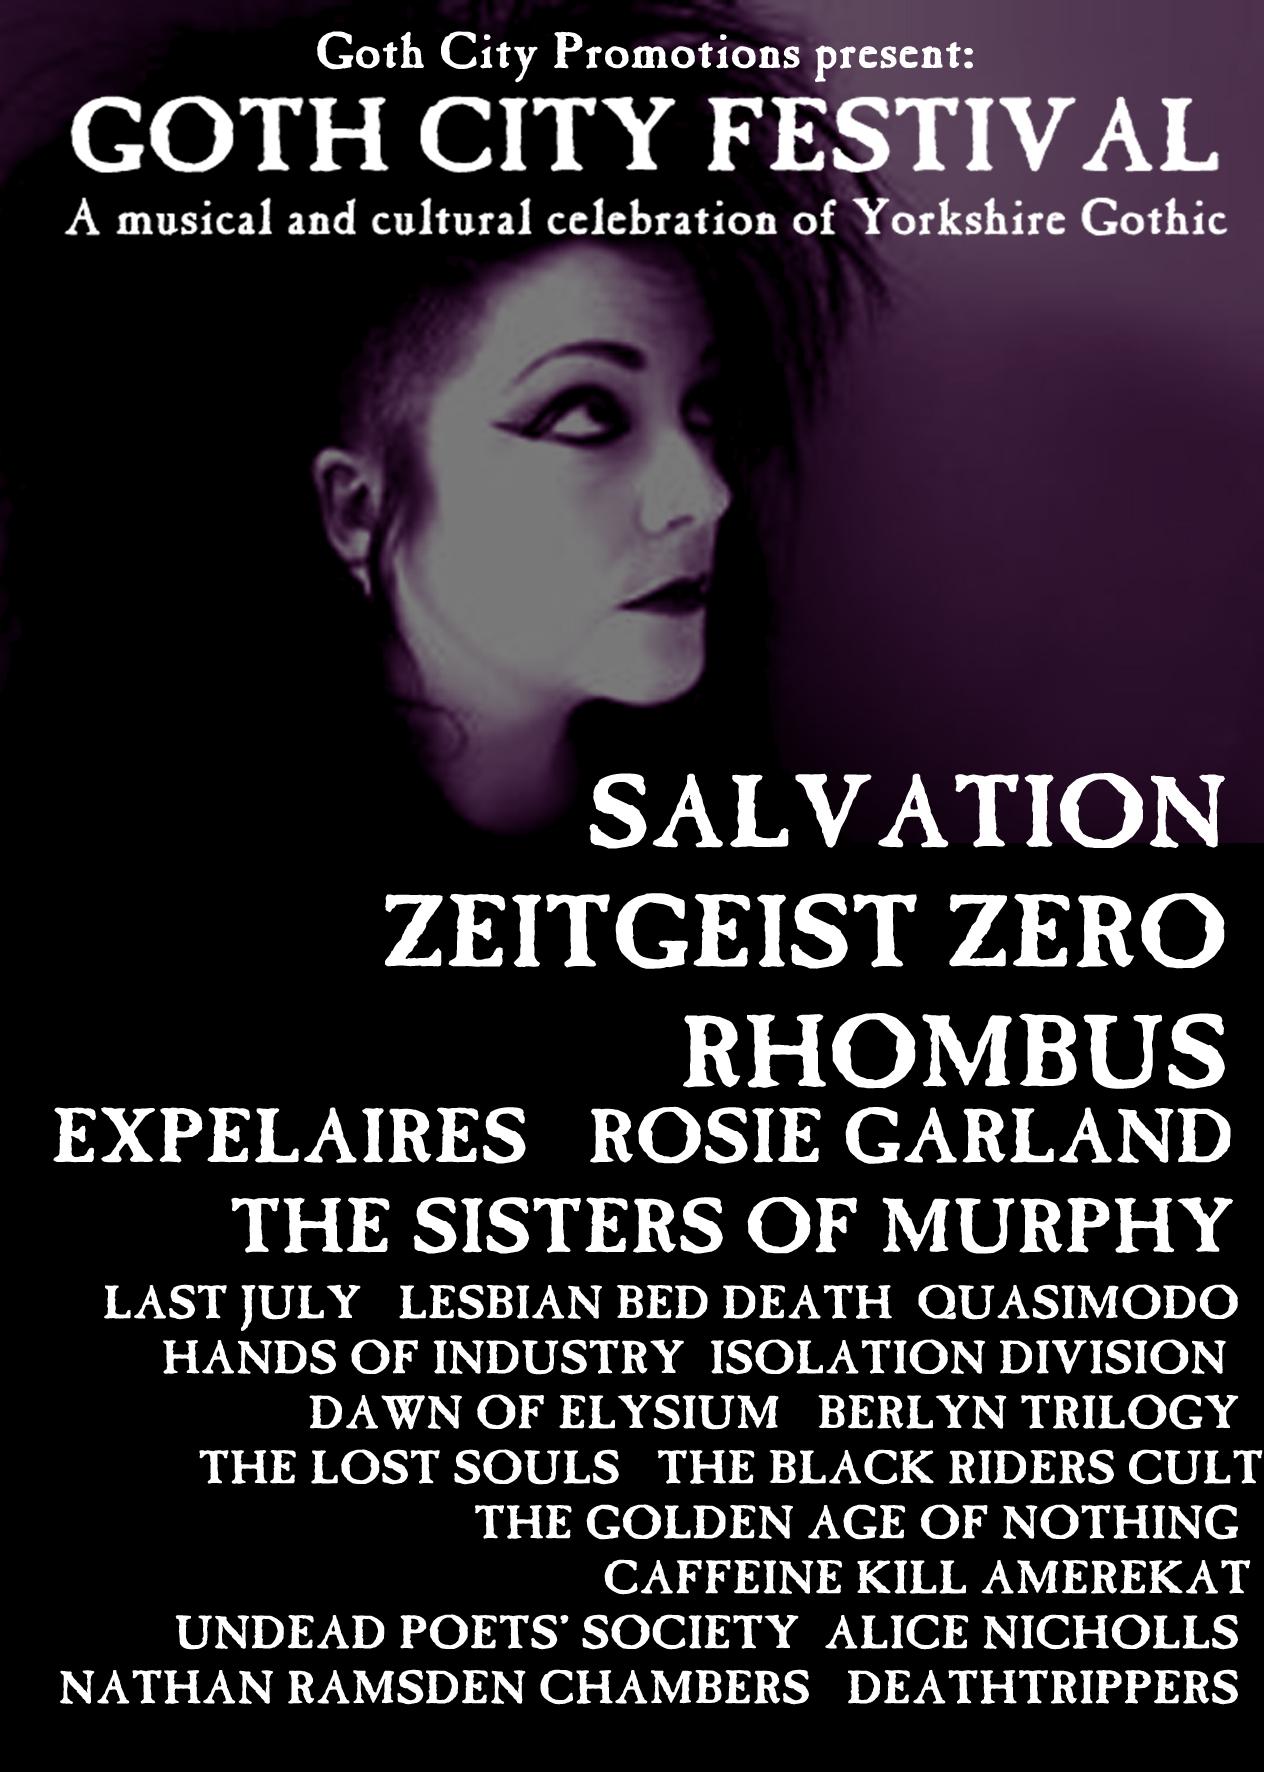 goth city festival flyer